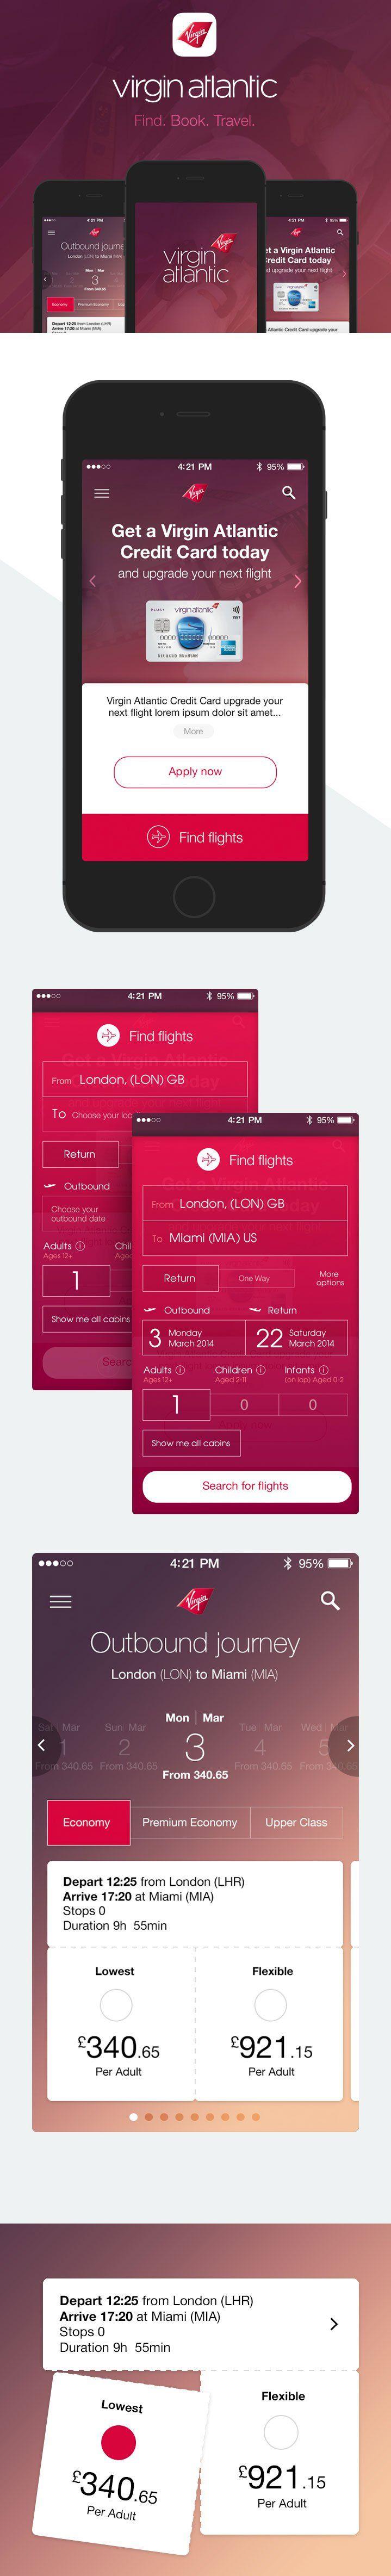 Virgin Atlantic app ios smartphone iphone booking reservation payment